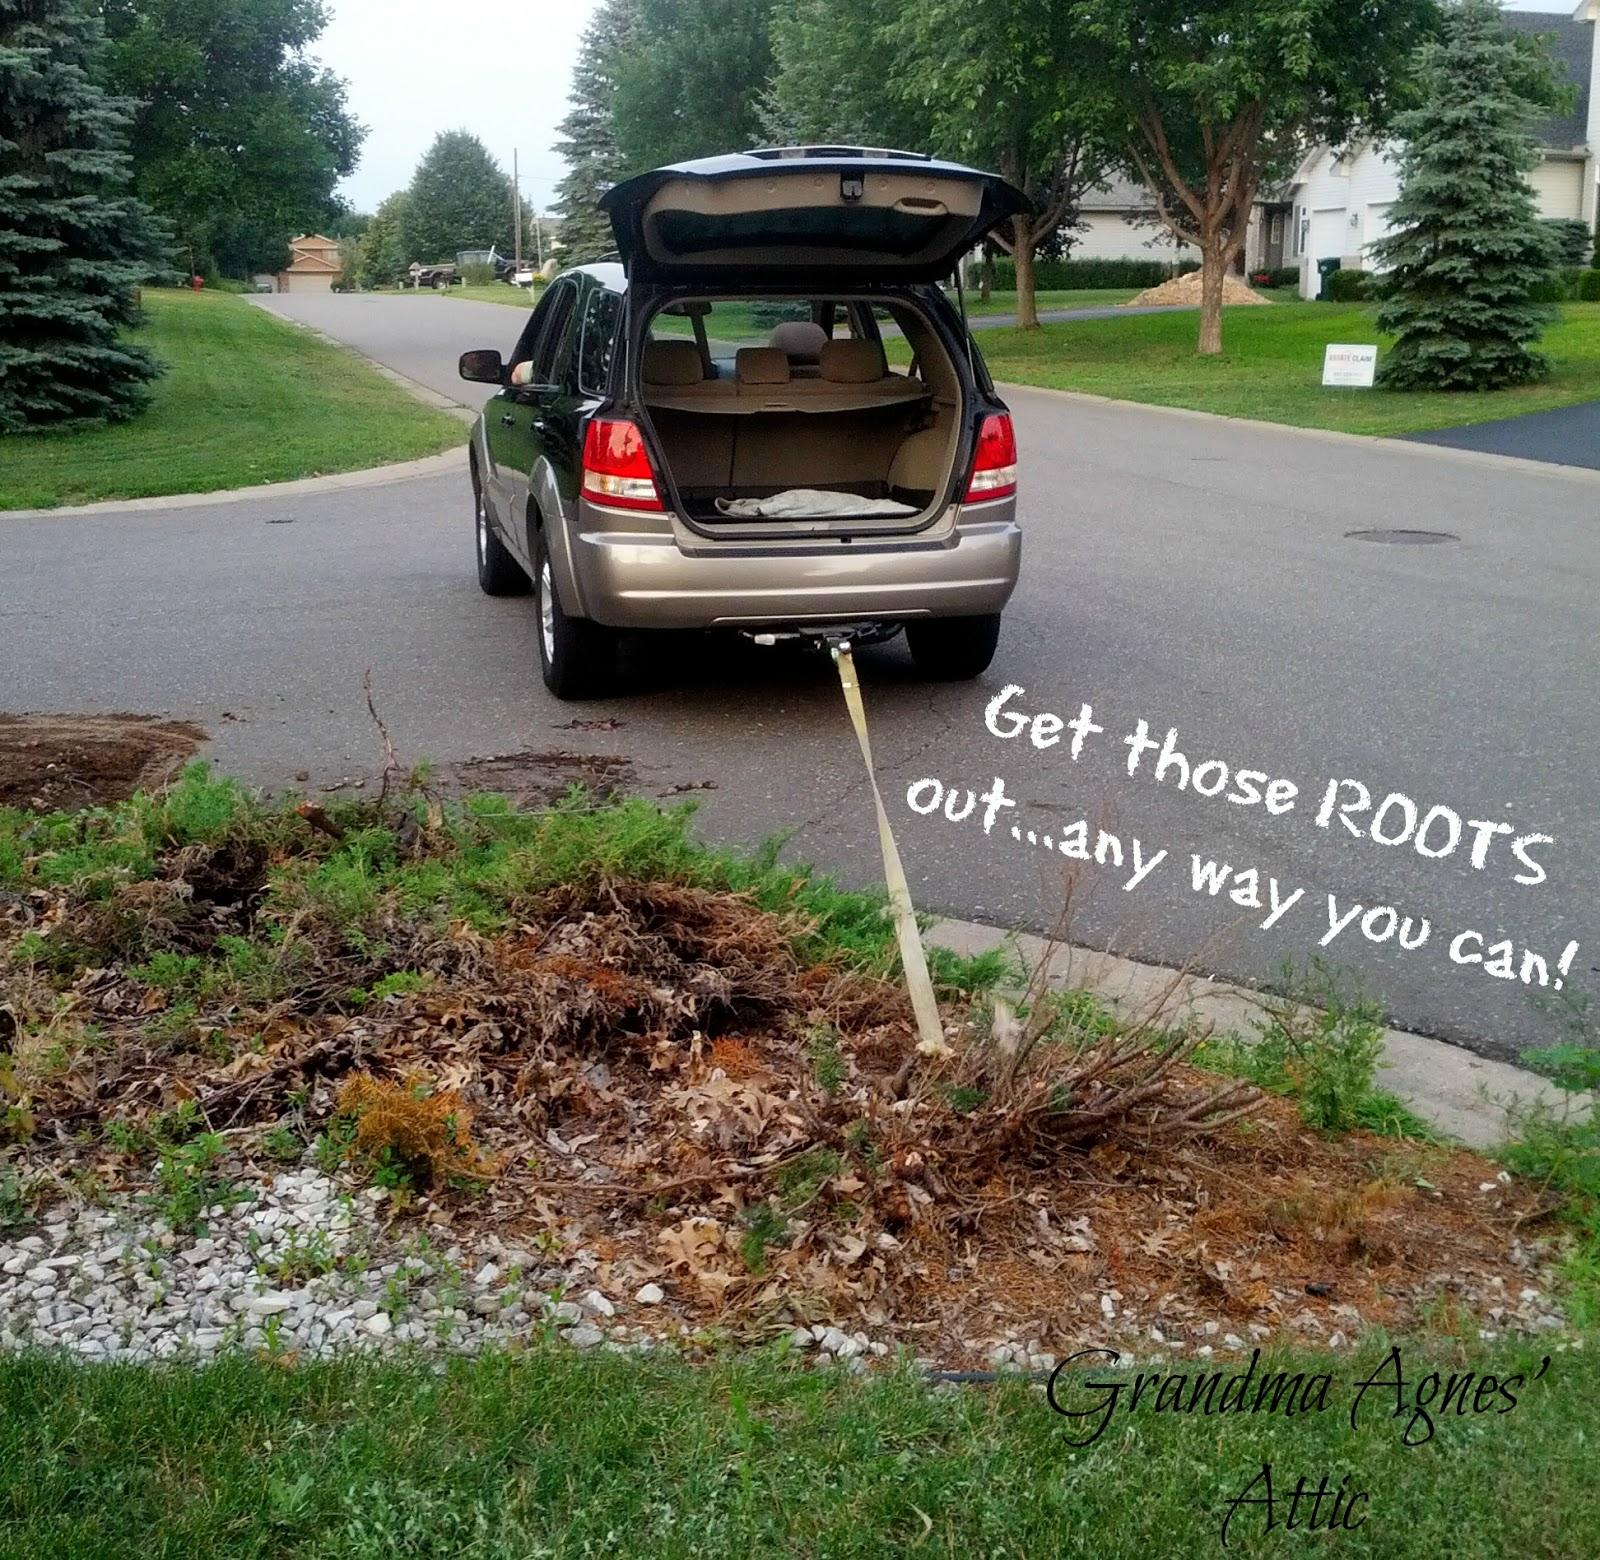 Grandma Agnes39 Attic Kids Bus Stop Landscaping Make Over